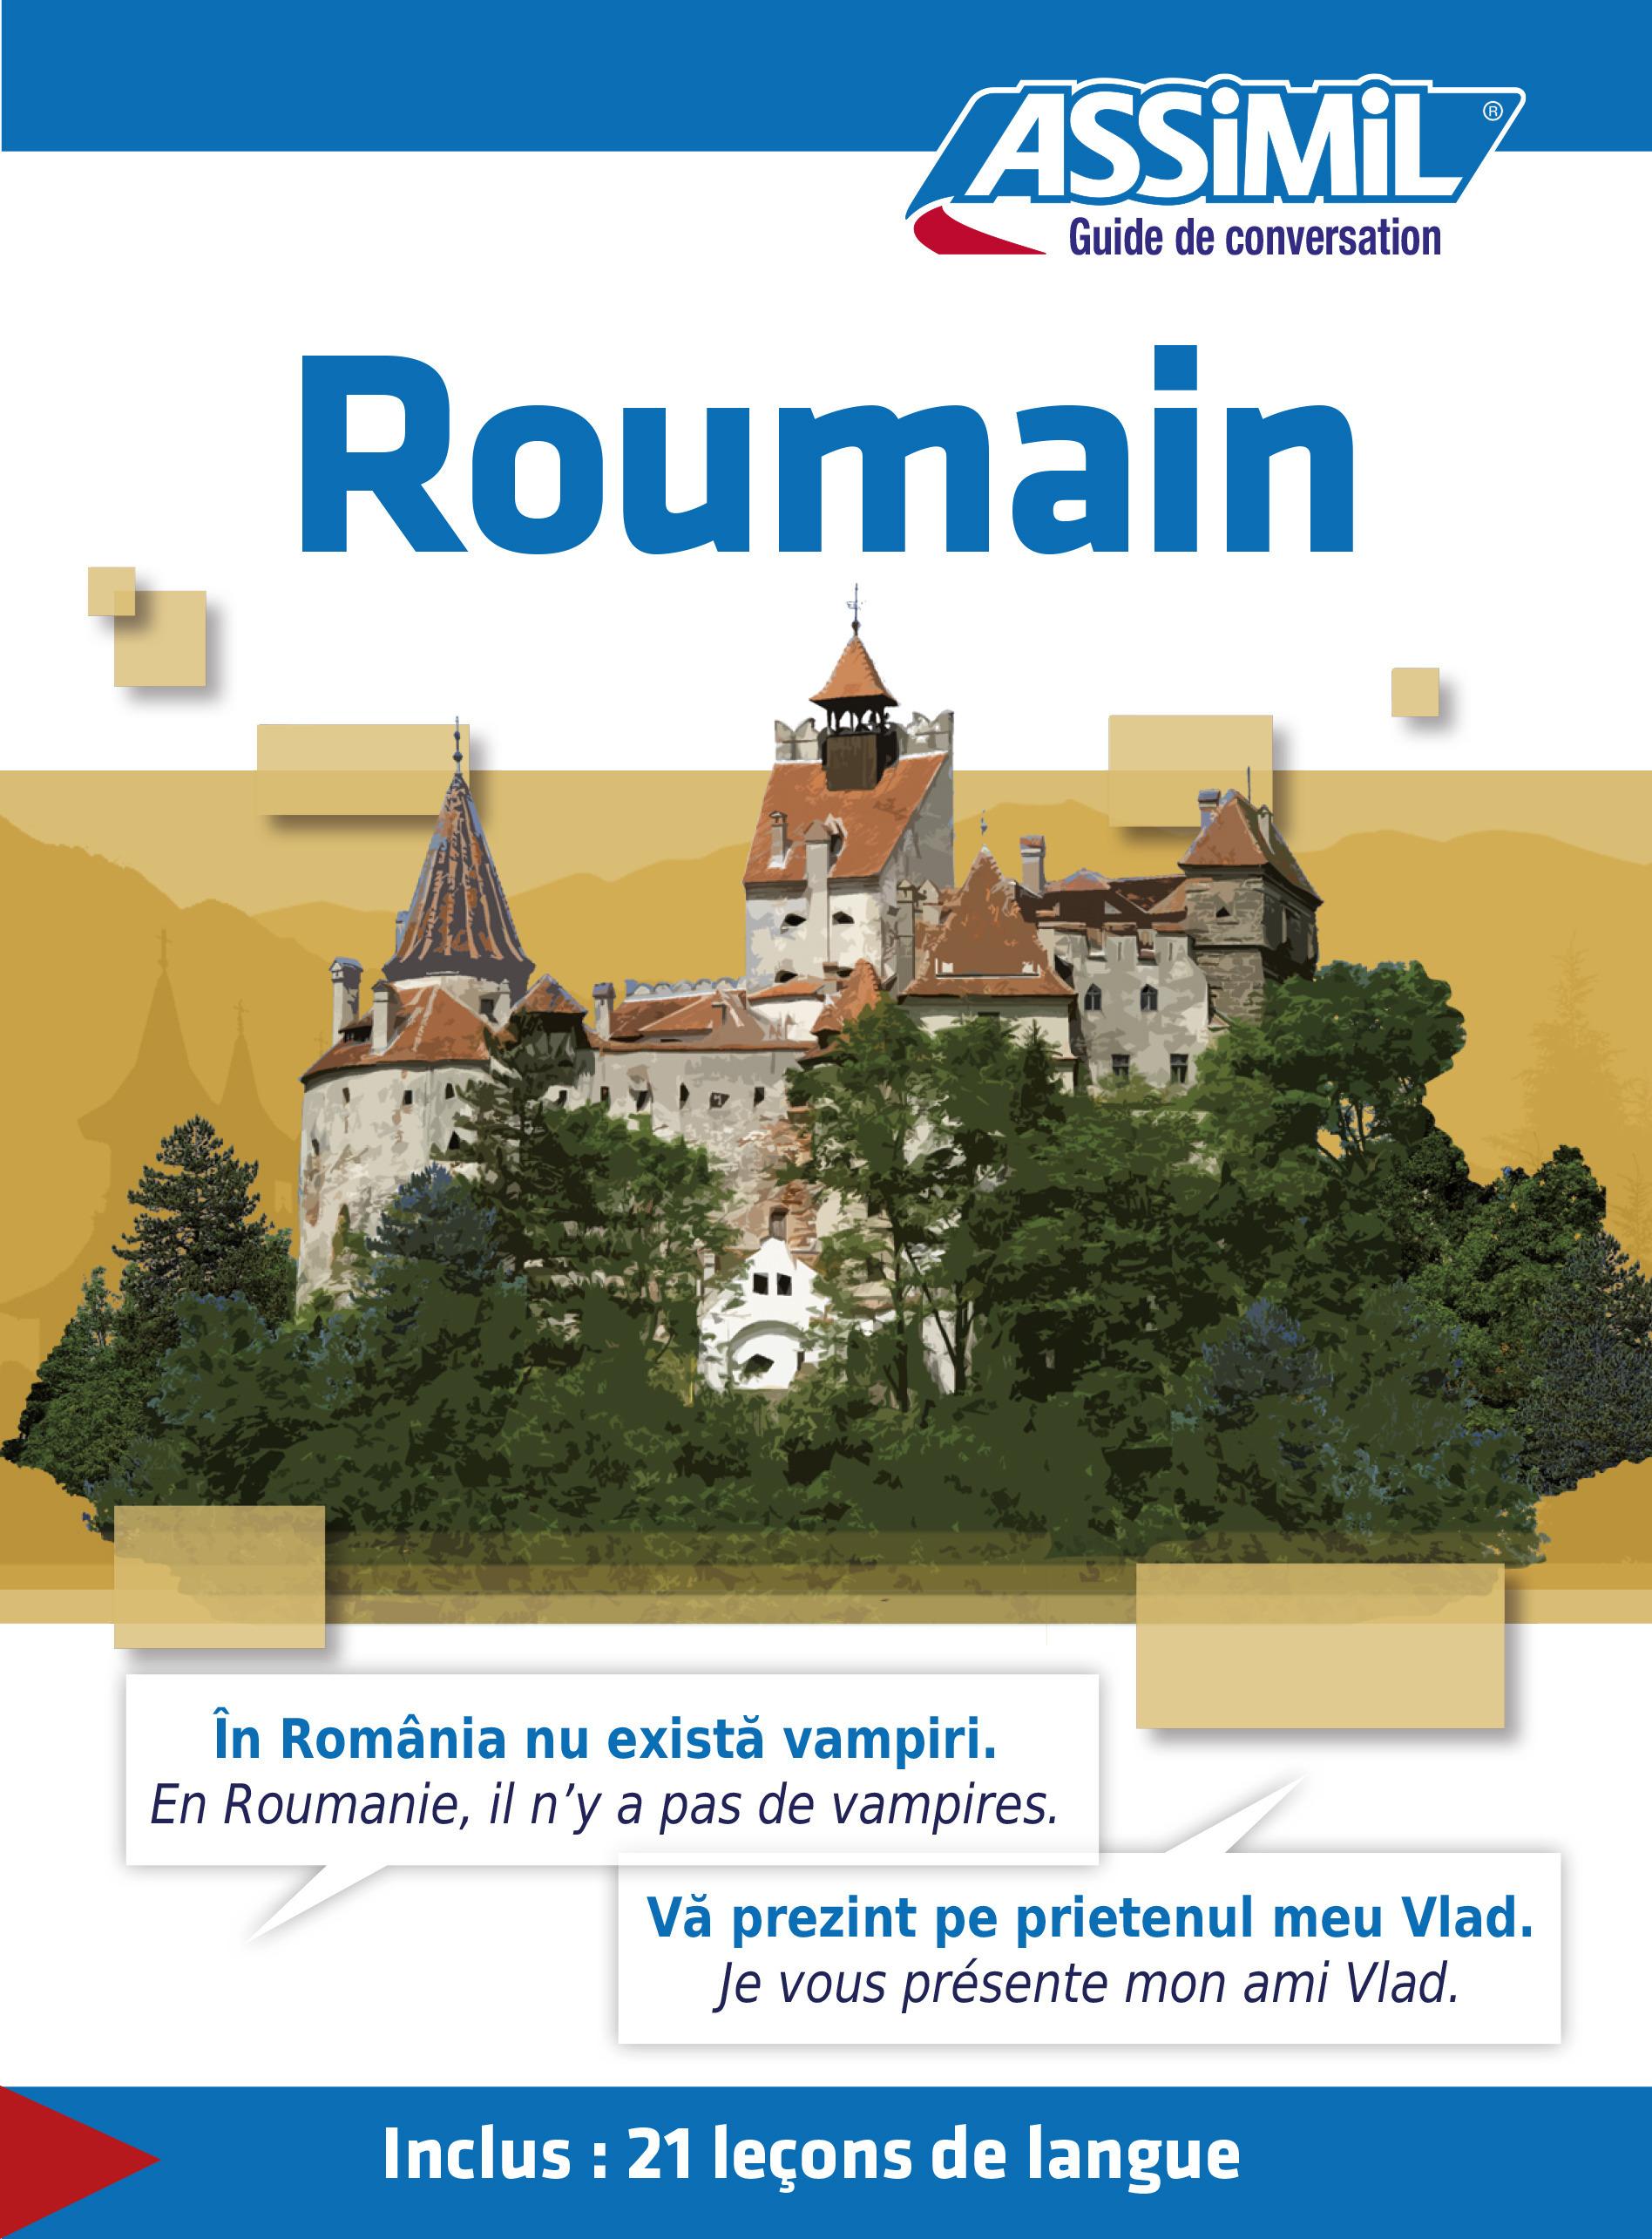 Liana Pop Roumain - Guide de conversation